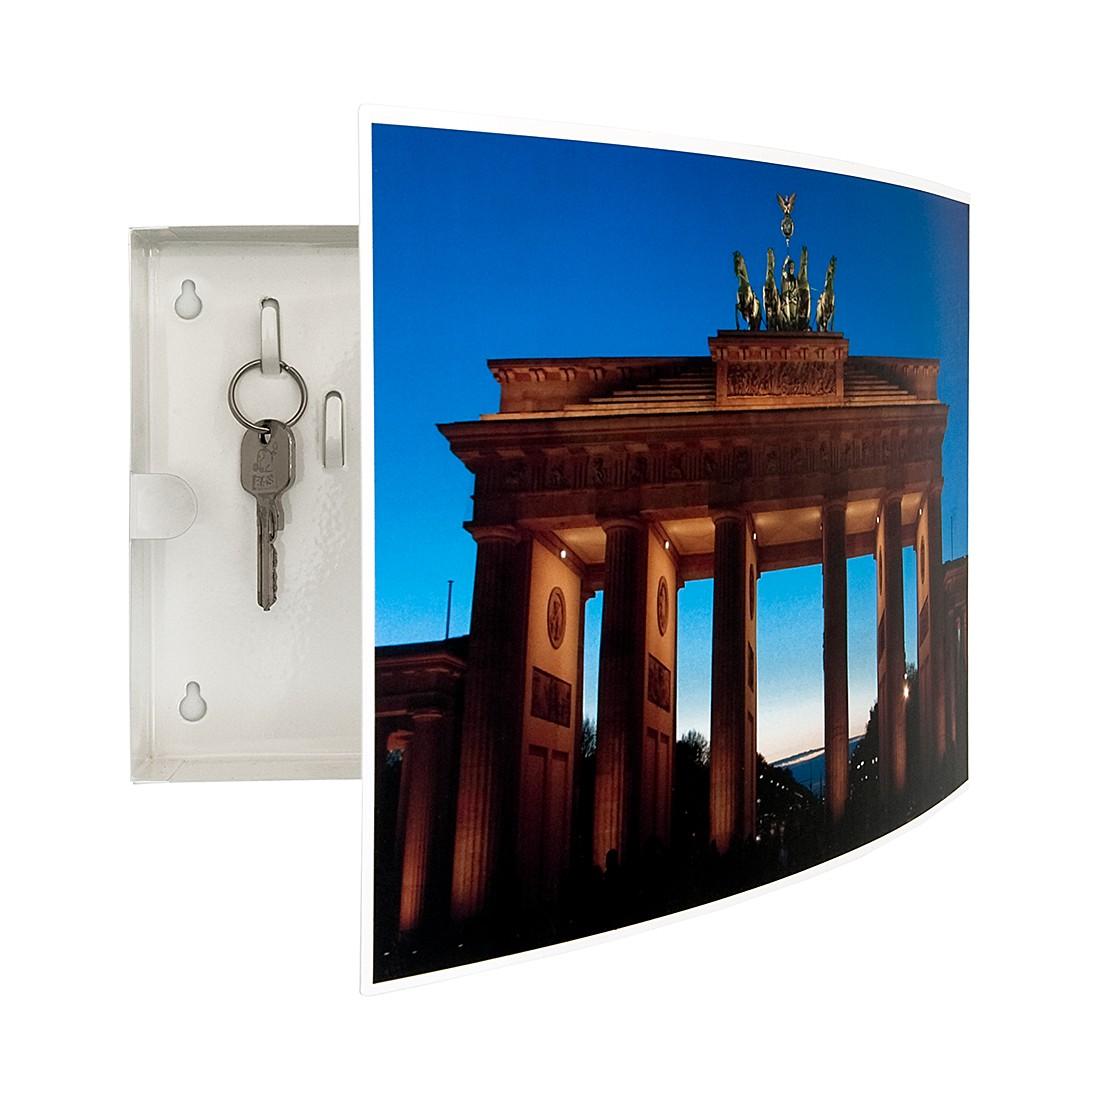 Schlüsselkasten City Berlin